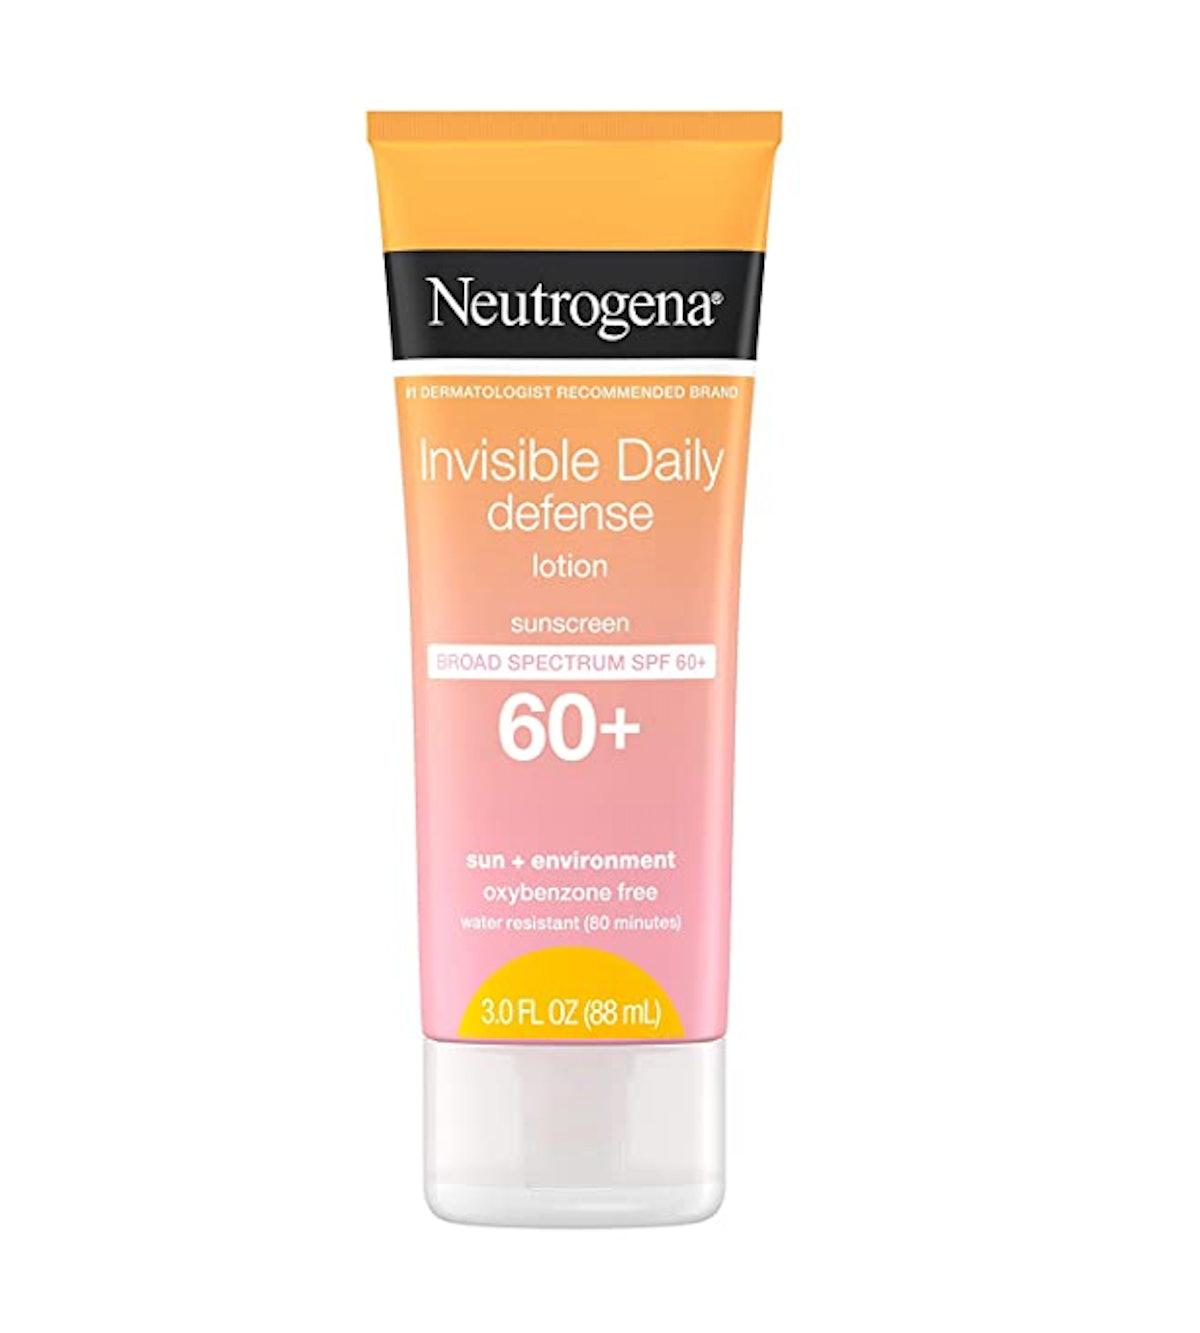 Neutrogena Invisible Daily Defense Sunscreen Lotion